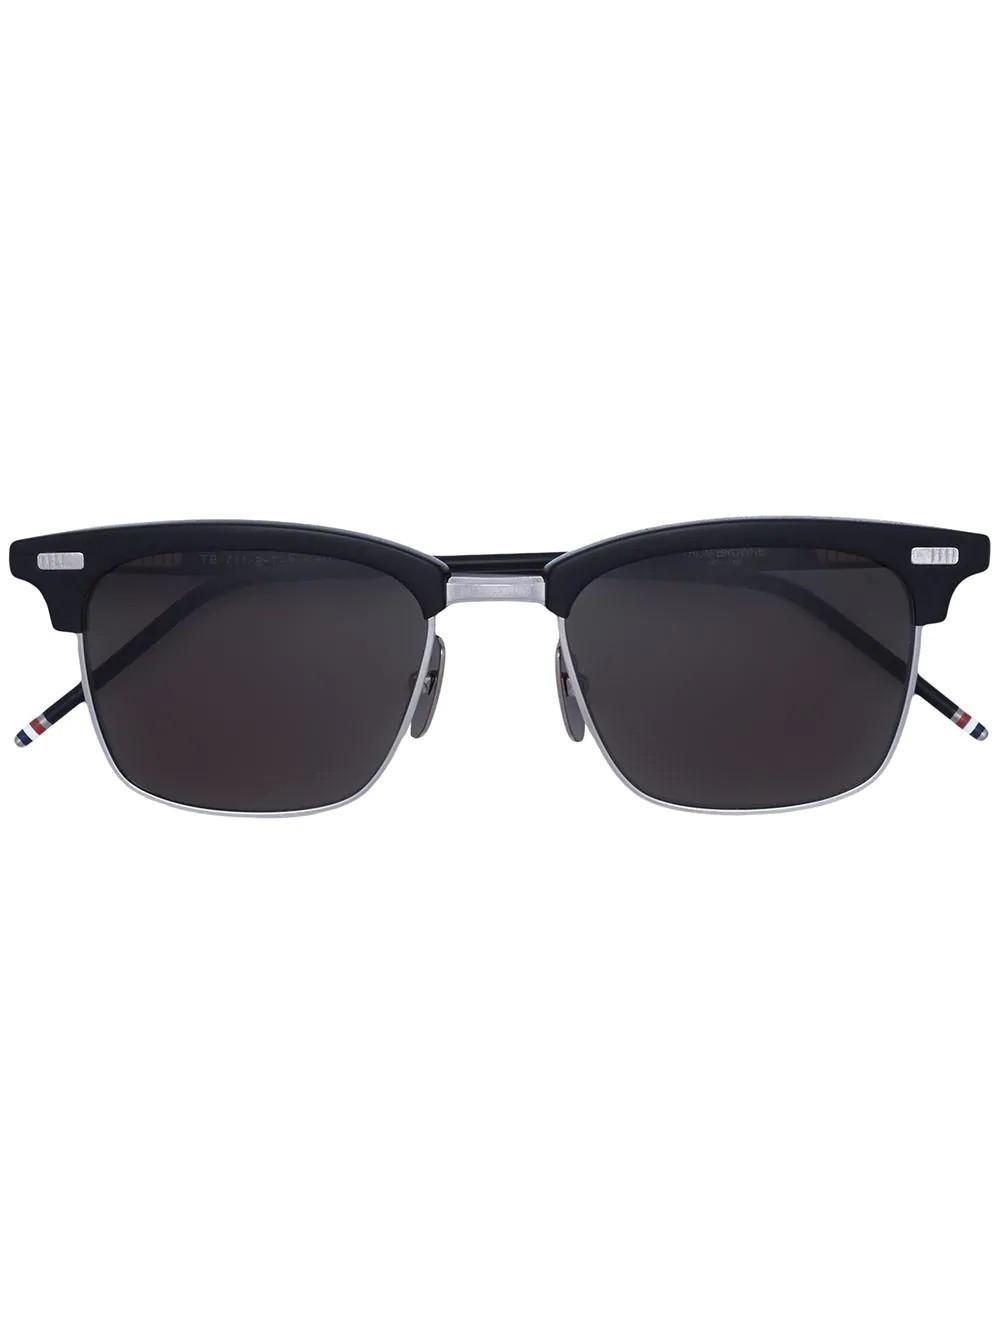 3bae2abd097 Thom Browne Black Square Frame Sunglasses